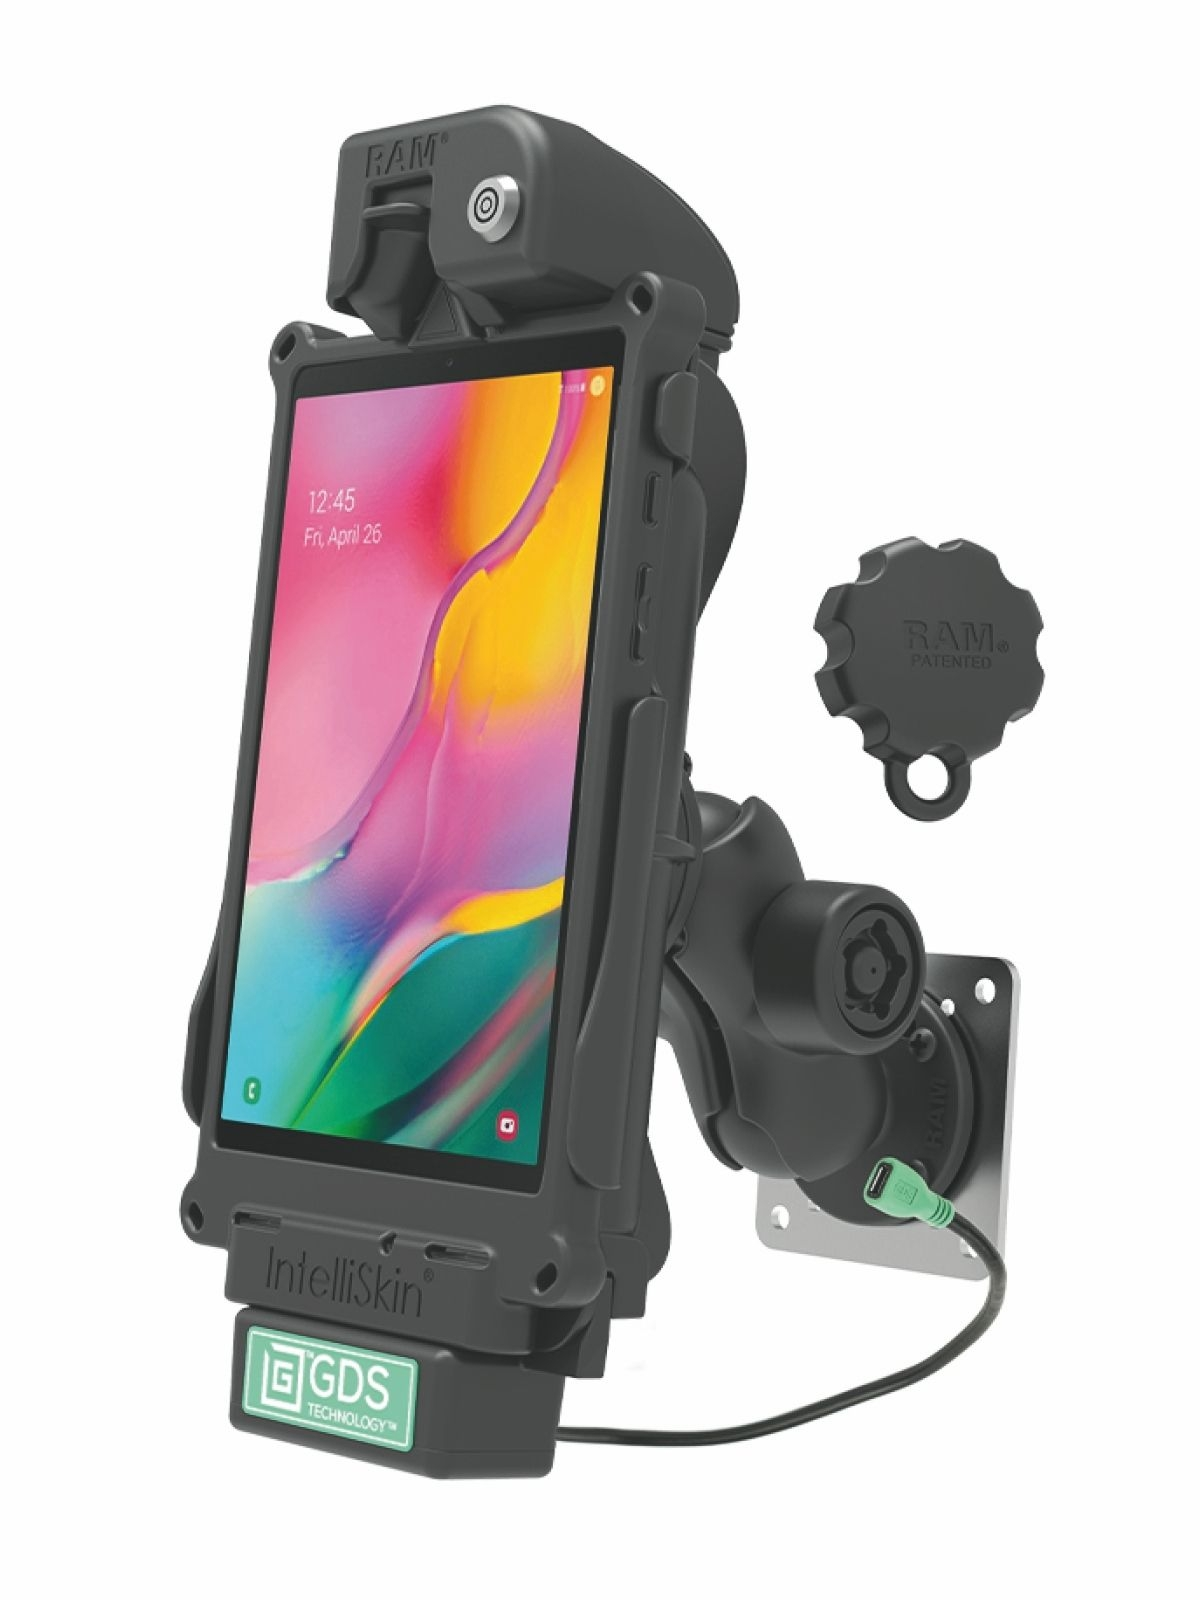 RAM Mounts GDS Bundle Dockingstation u. IntelliSkin-Lade-/Schutzhülle Samsung Tab A 8.0 (SM-T290, SM-T295) - microUSB-Stromanbindung, abschließbar, für Wandbefestigung geeignet, Pin-Lock Sicherung